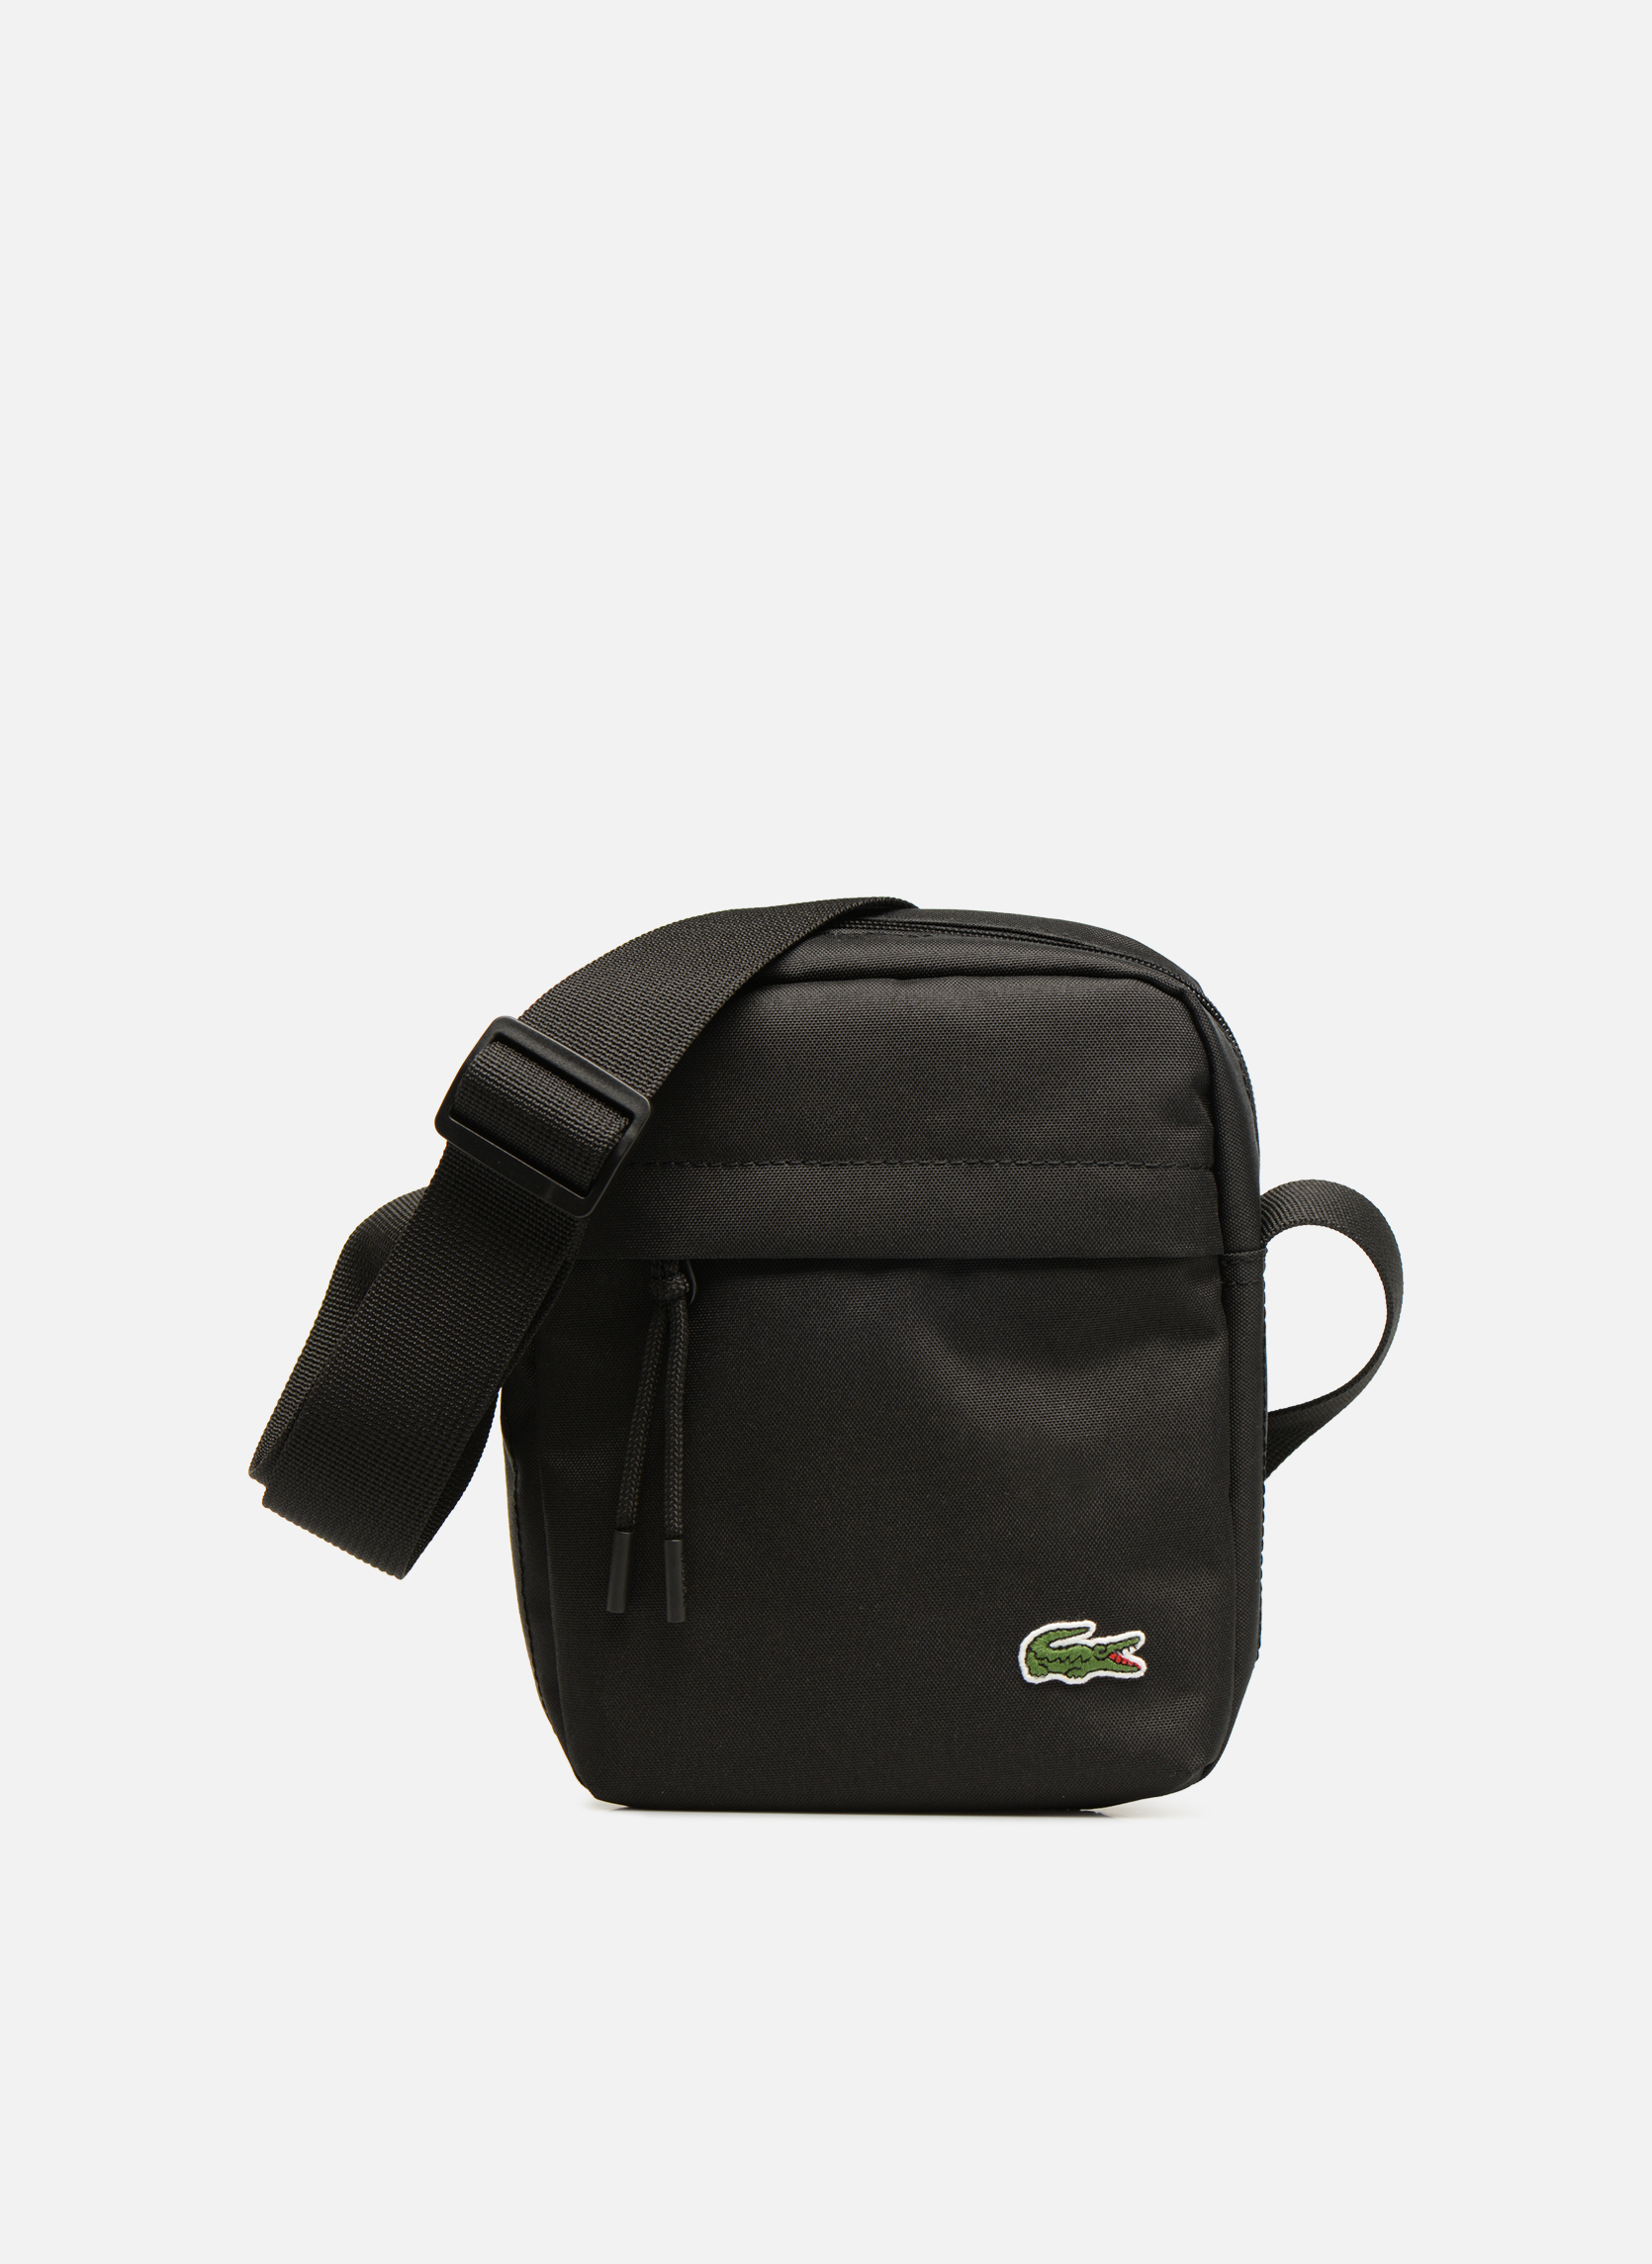 Neocroc Vertical Camera Bag